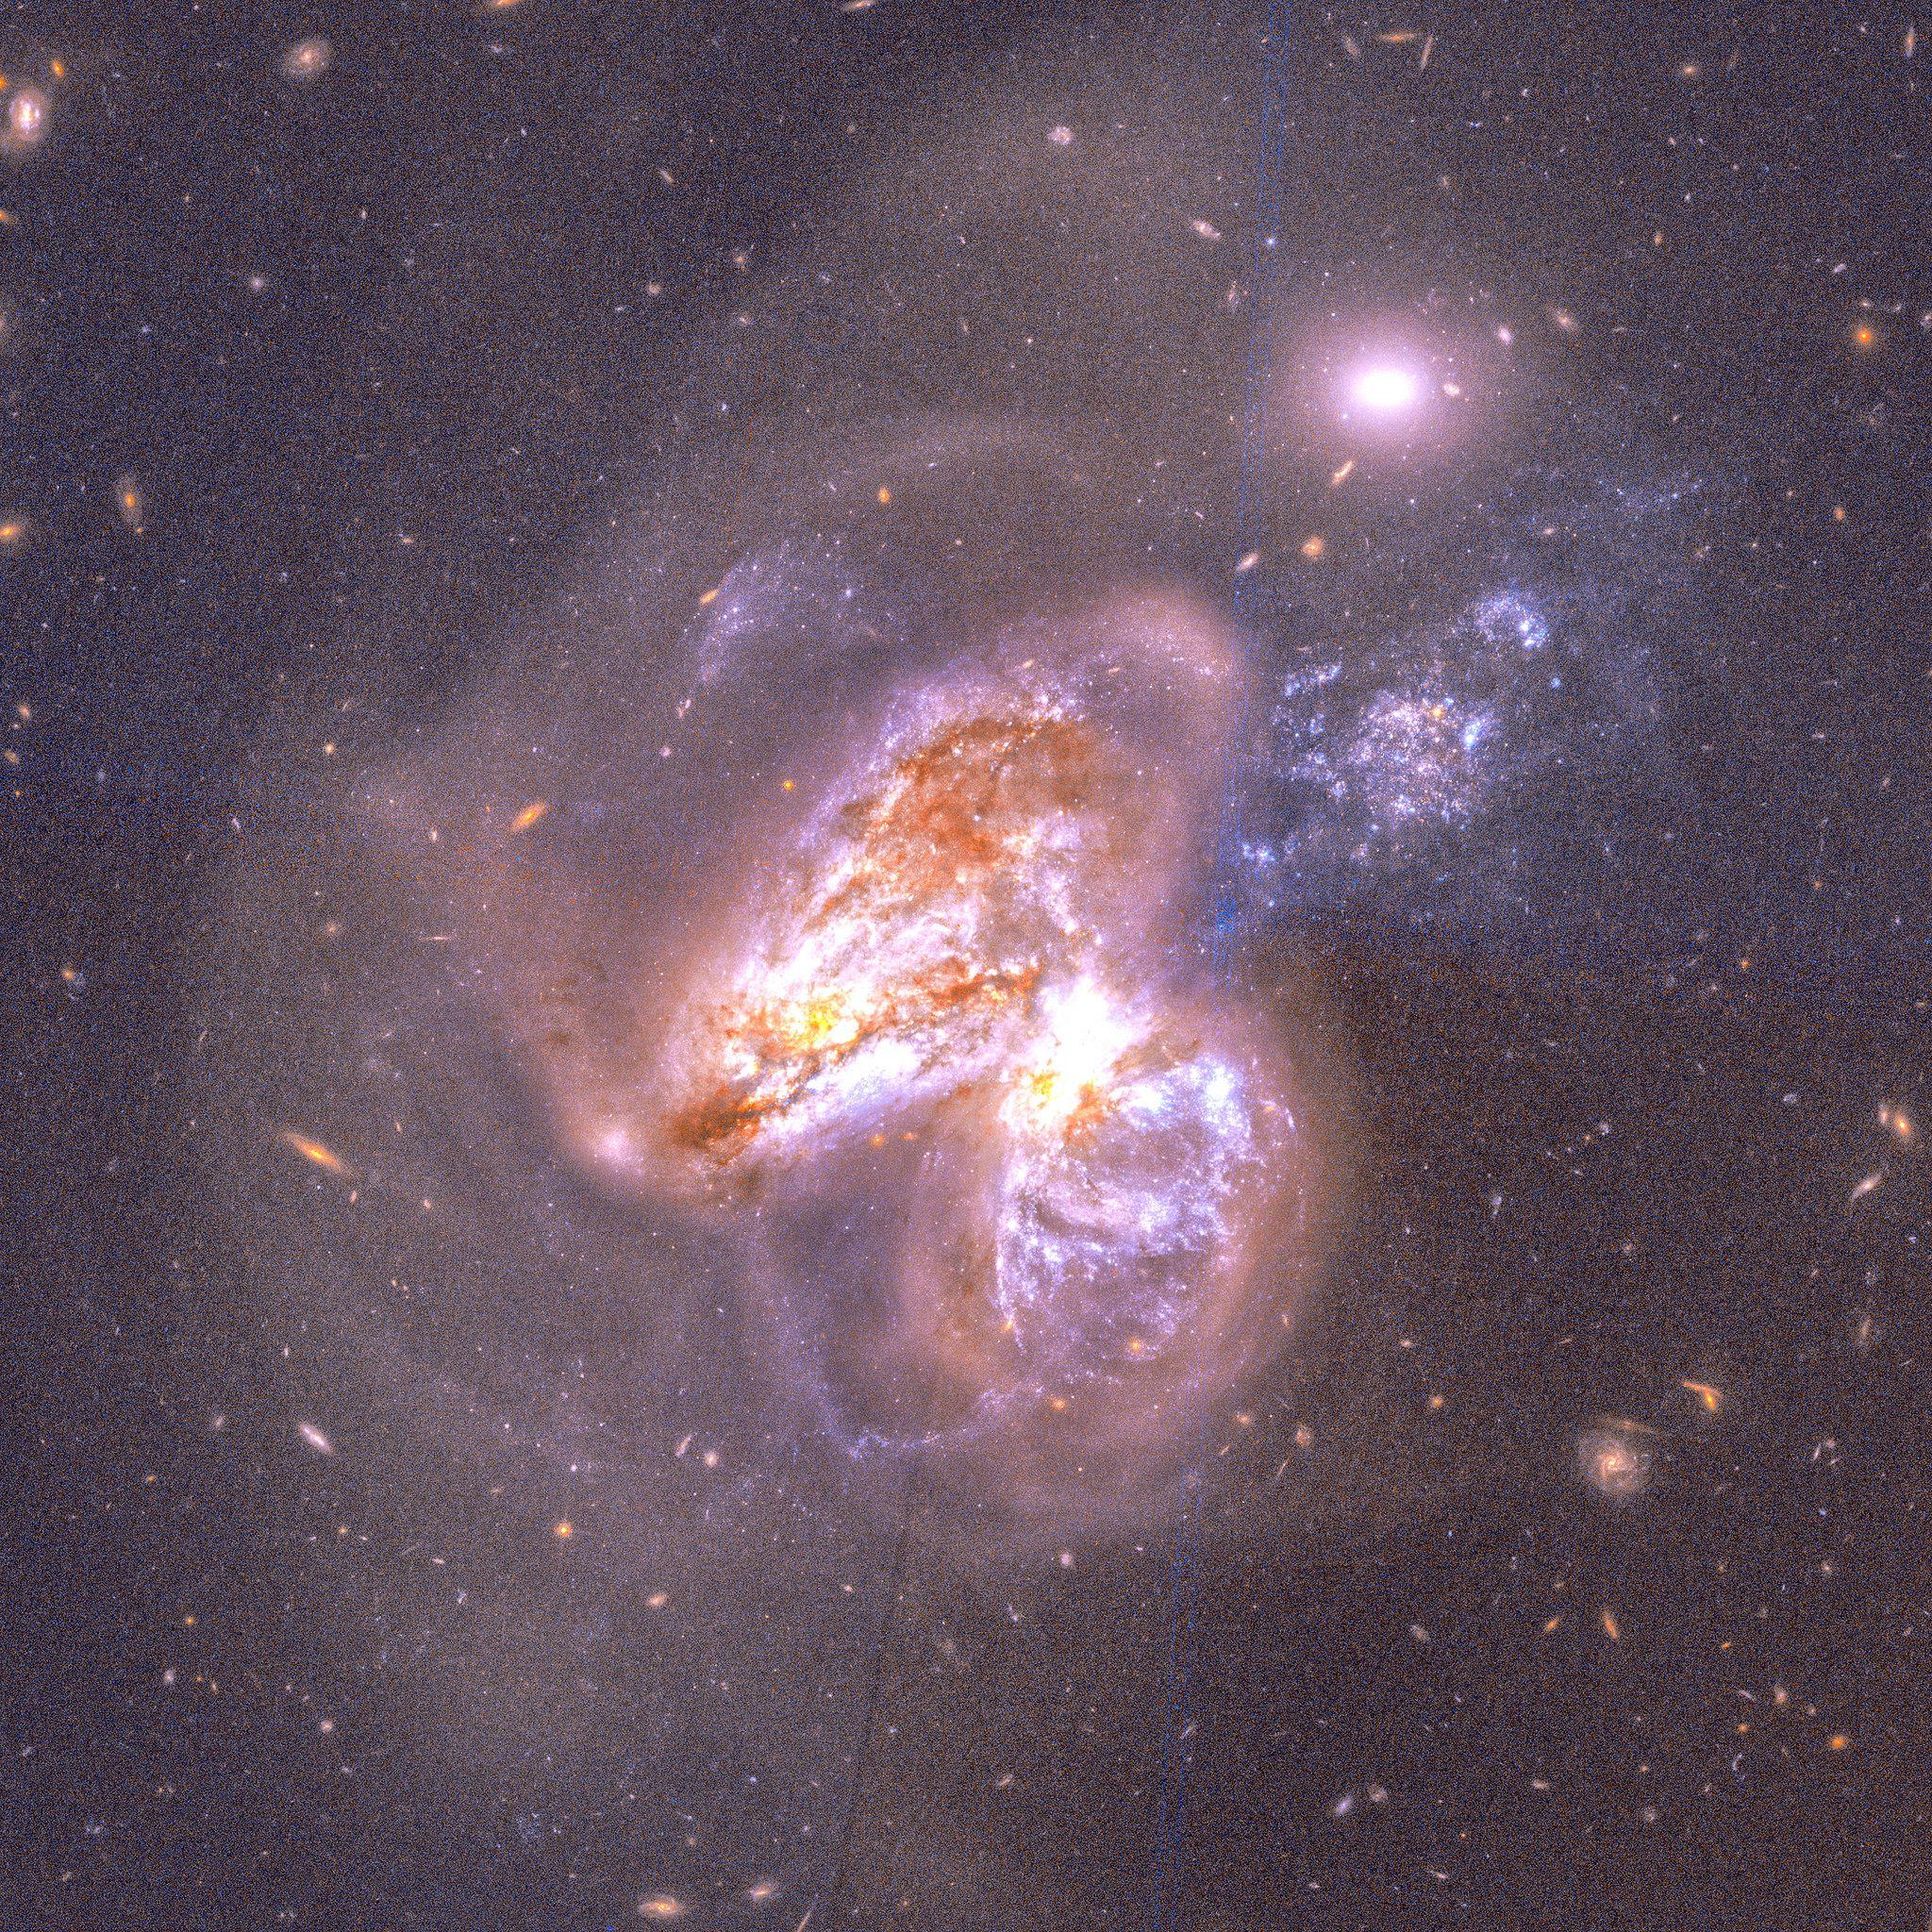 12_5_Galaxies collide